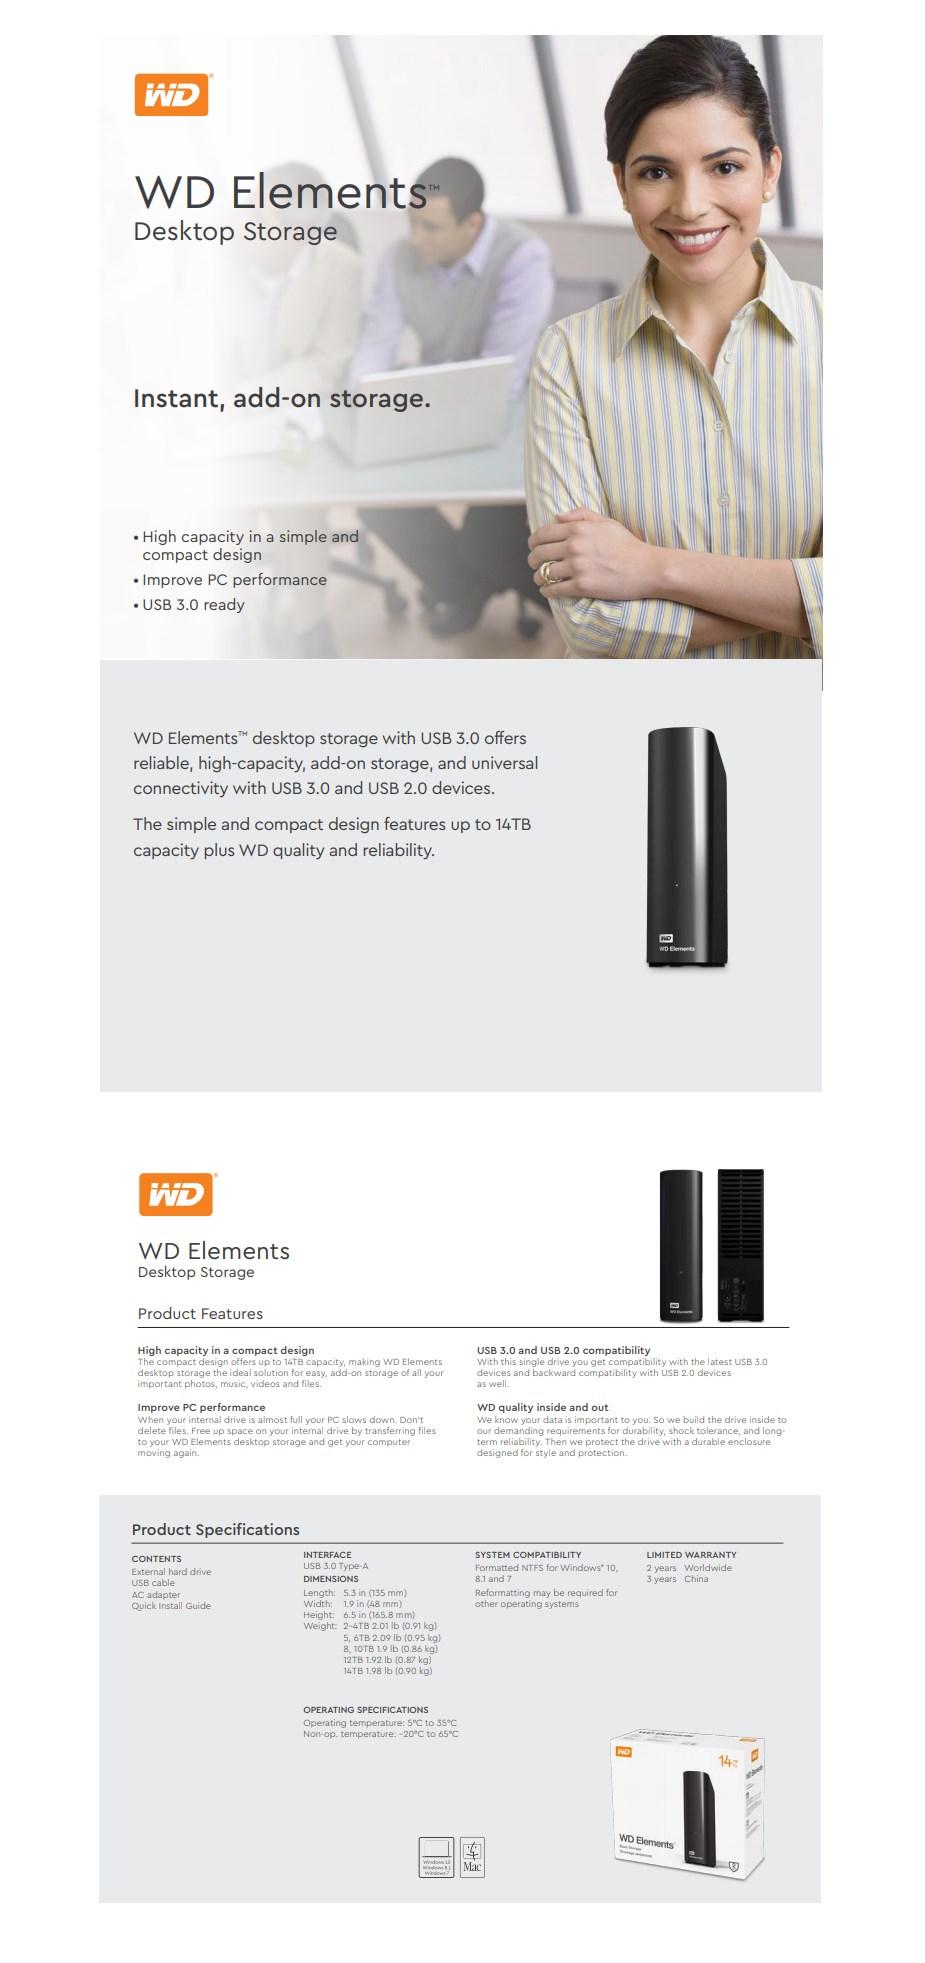 wd-elements-3tb-usb-30-desktop-external-hard-drive-wdbbkg0030hbkaesn-ac37565-9.jpg